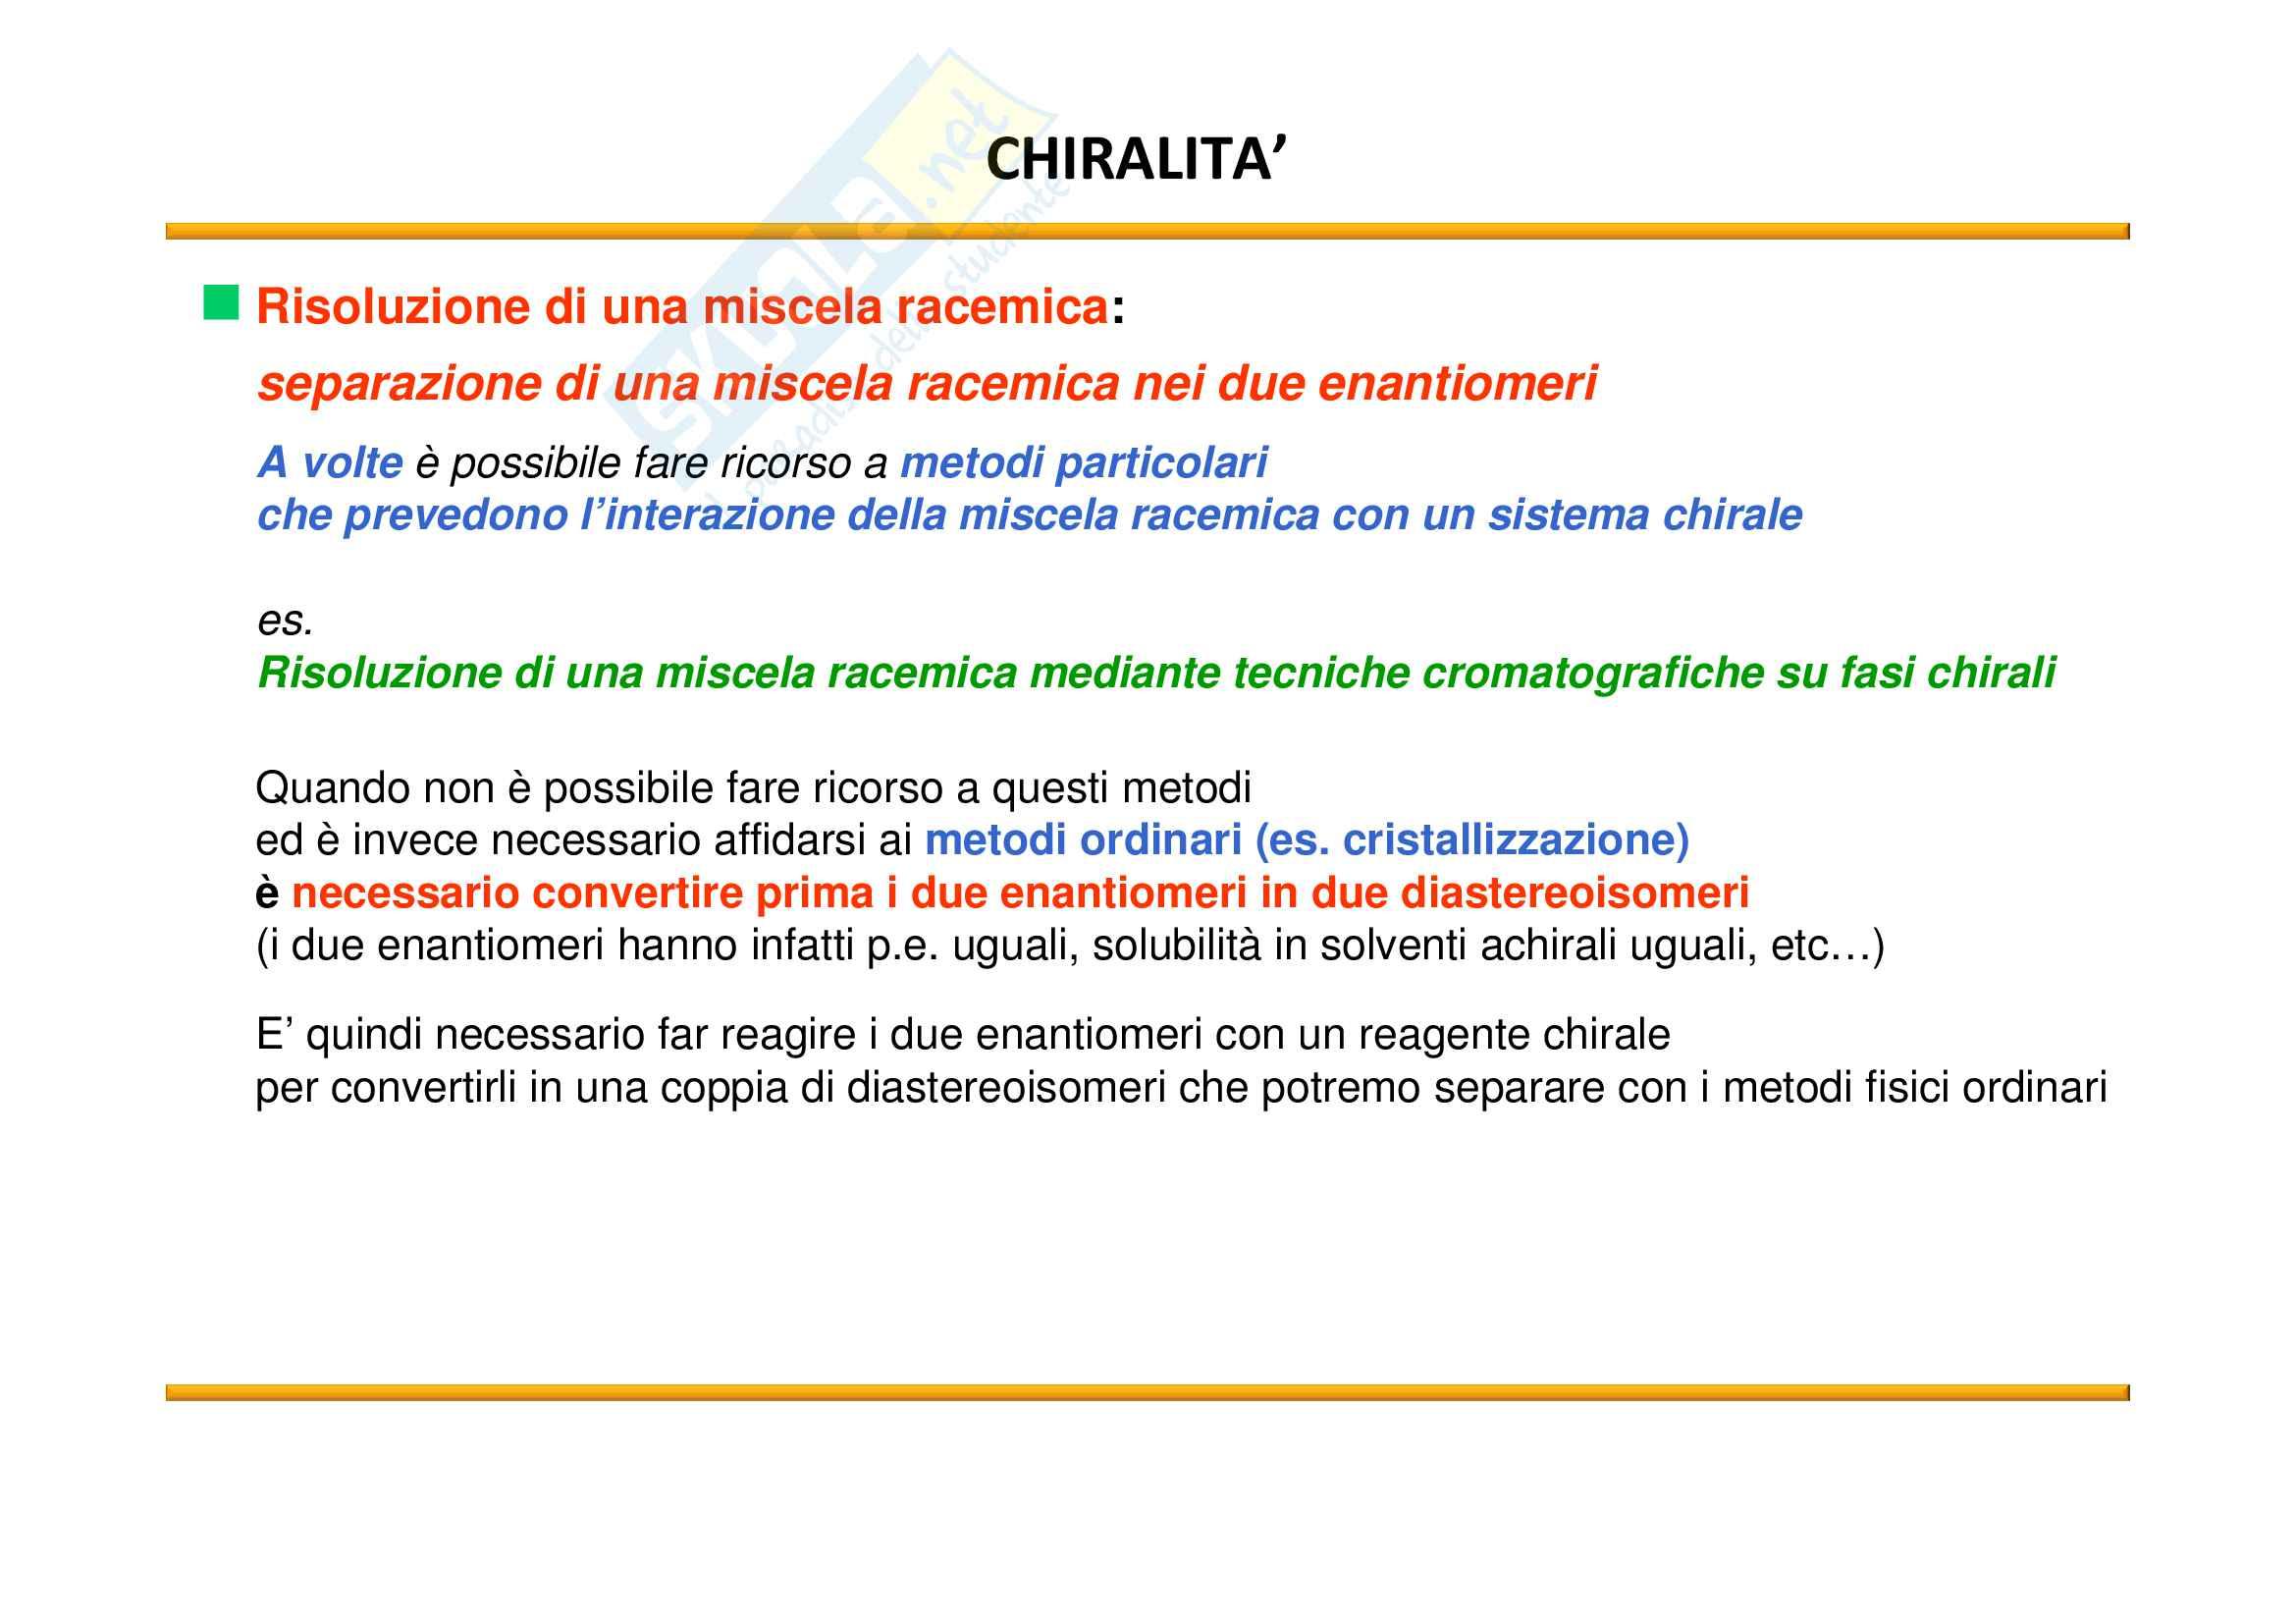 Chimica Organica: Chiralità Pag. 71